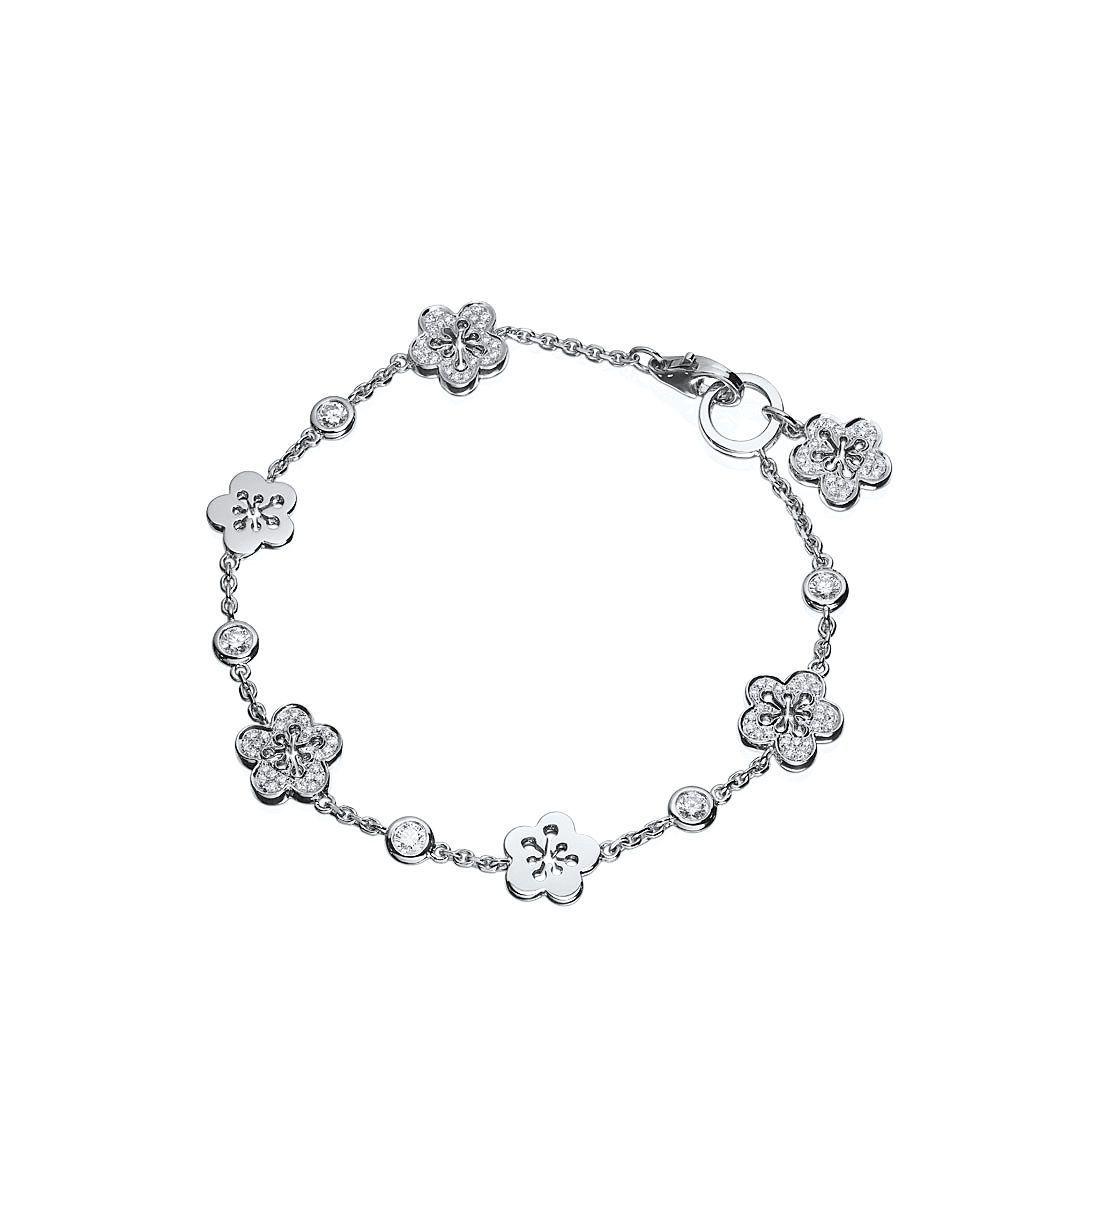 A charming white gold diamond charm bracelet from boodlesu blossom